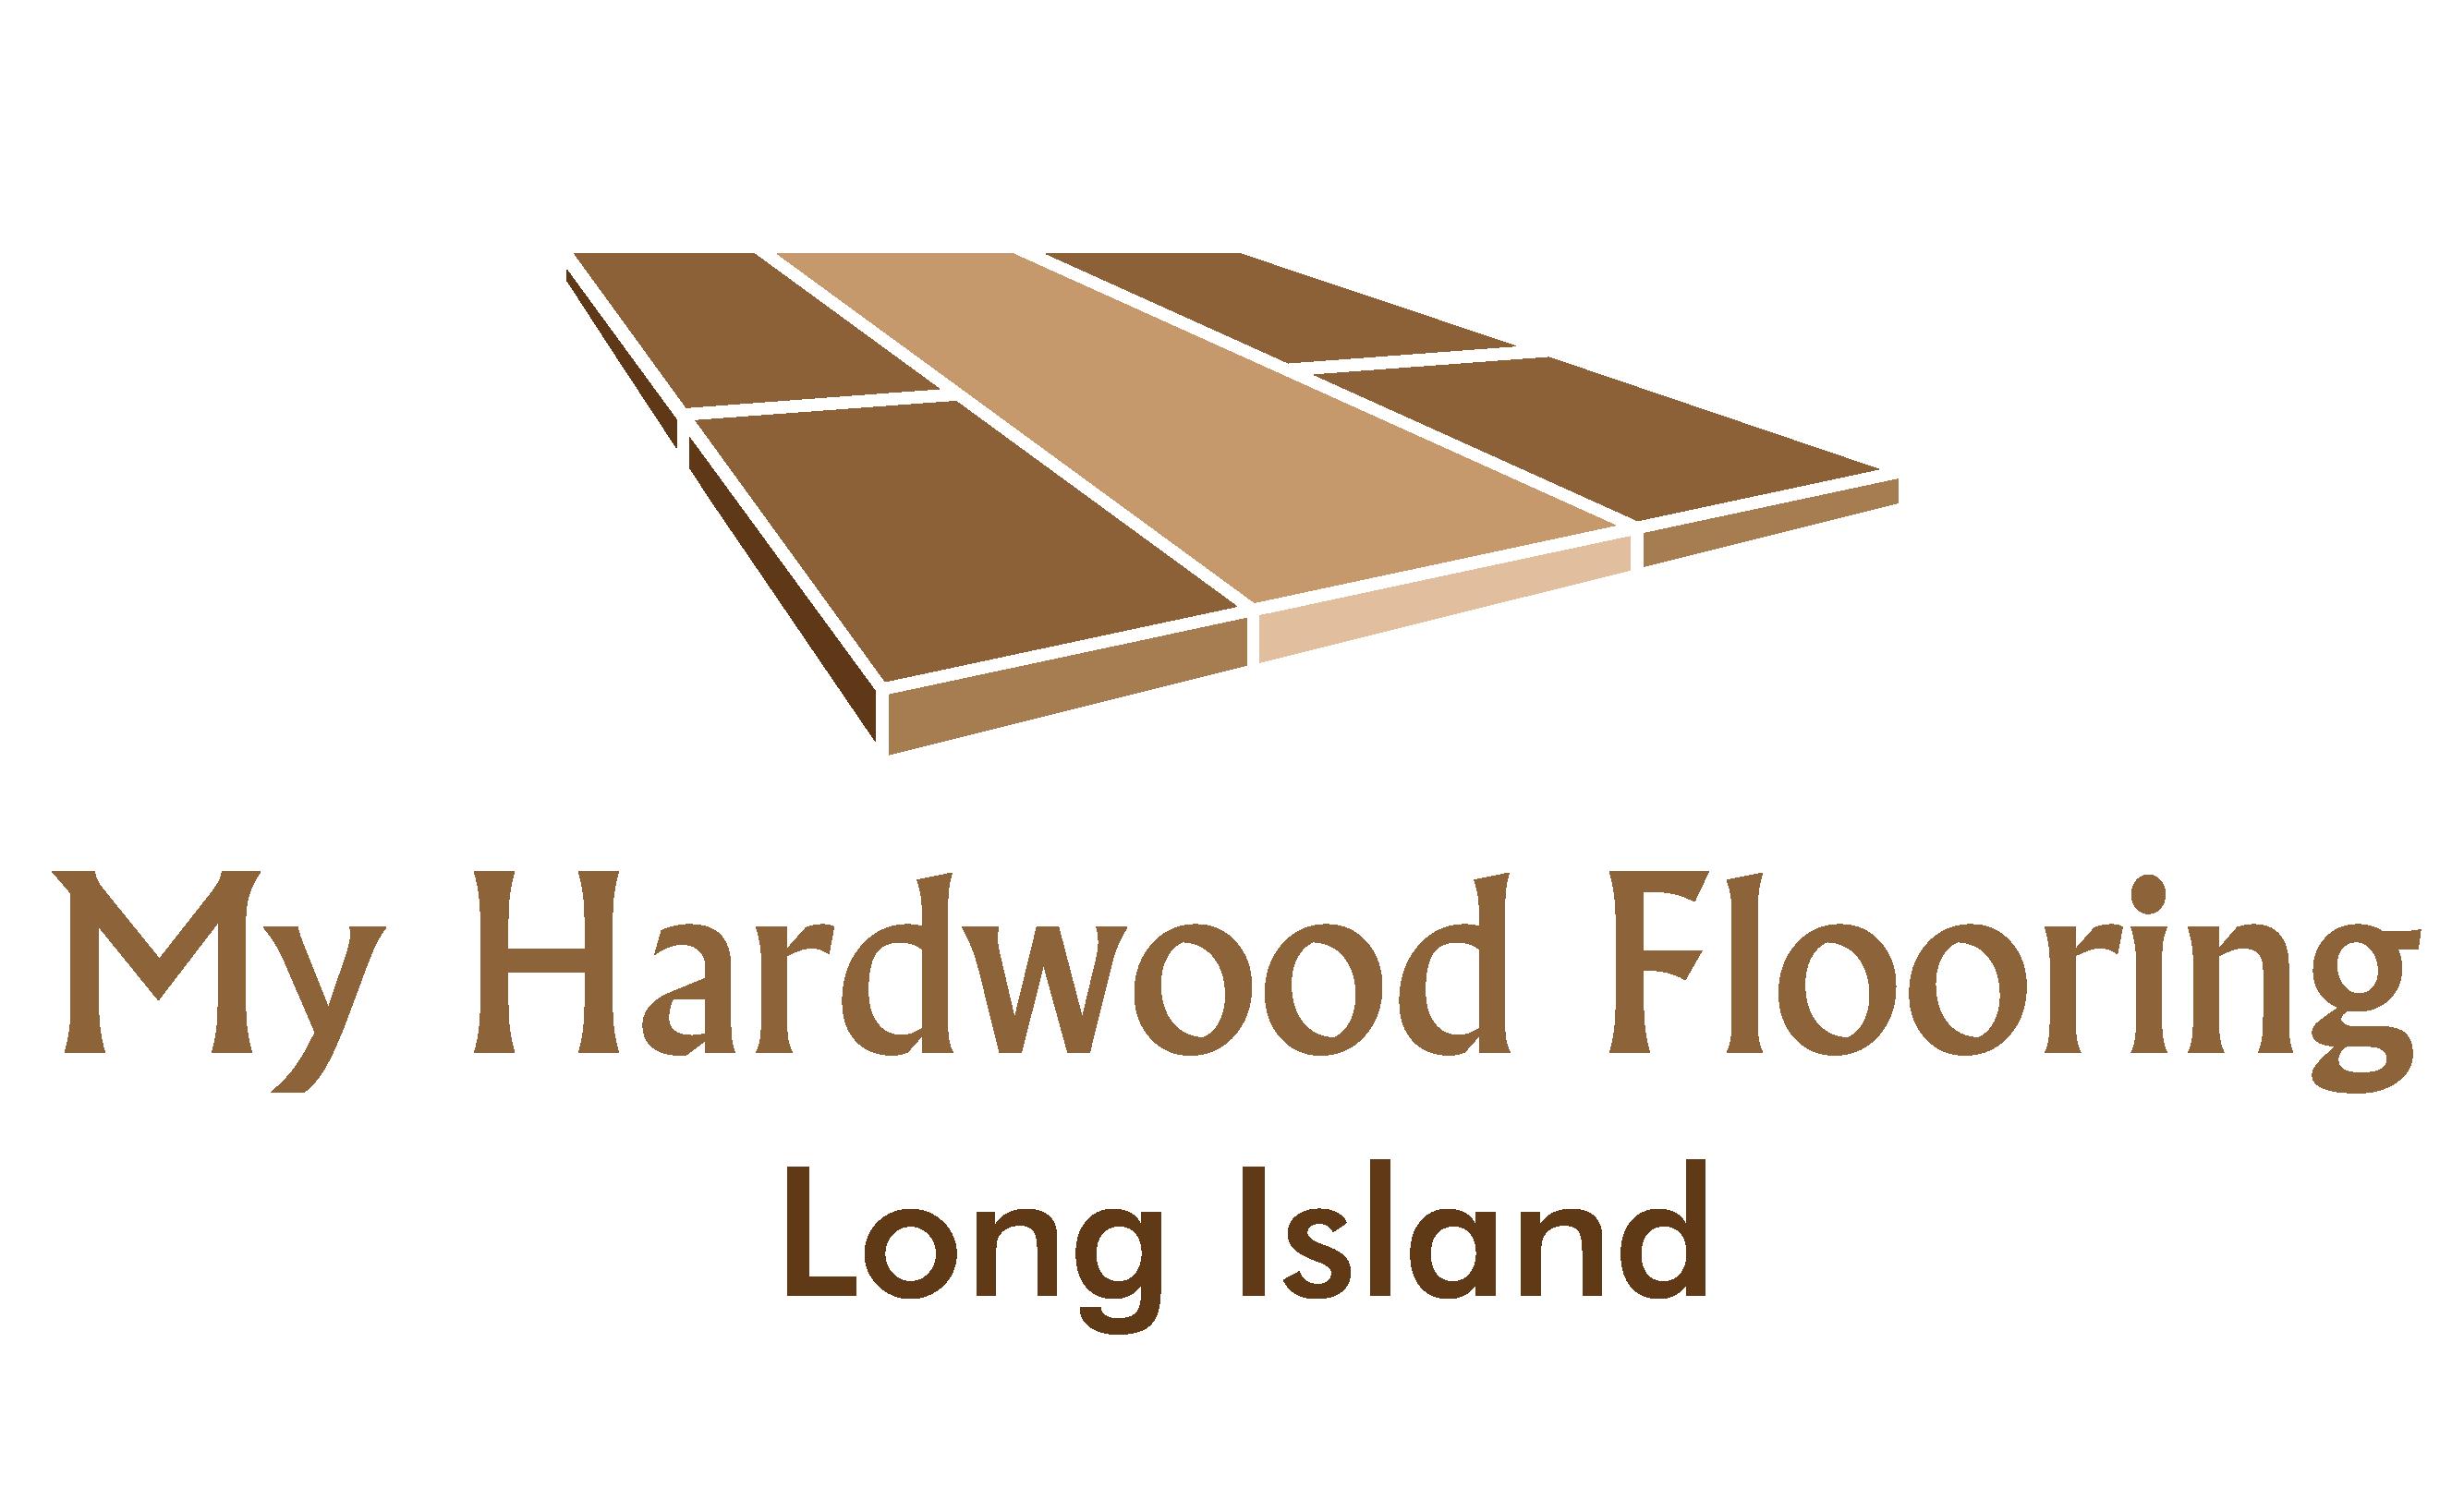 My Hardwood Flooring Long Island.png